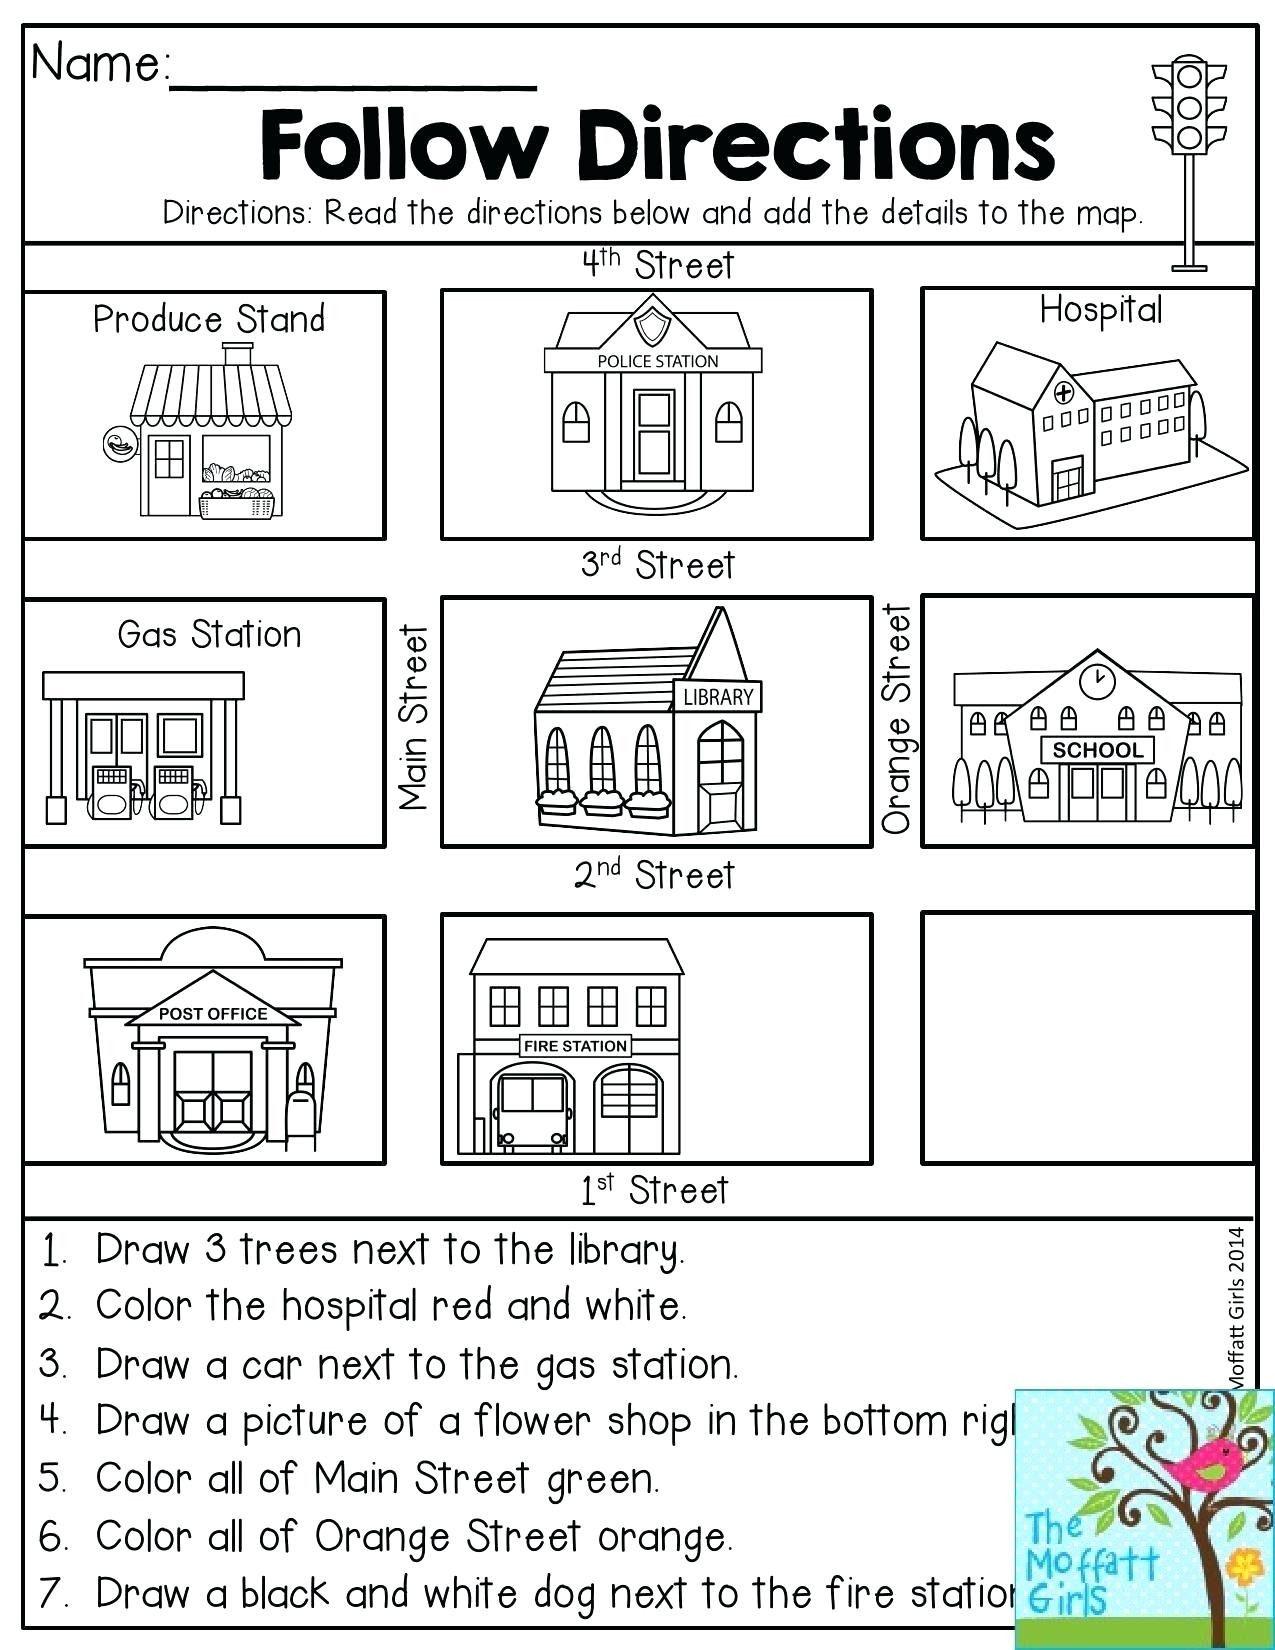 Compass Worksheets For Kids Kindergarten Social Studies Social Studies Worksheets Teaching Social Studies Reading map worksheet grade